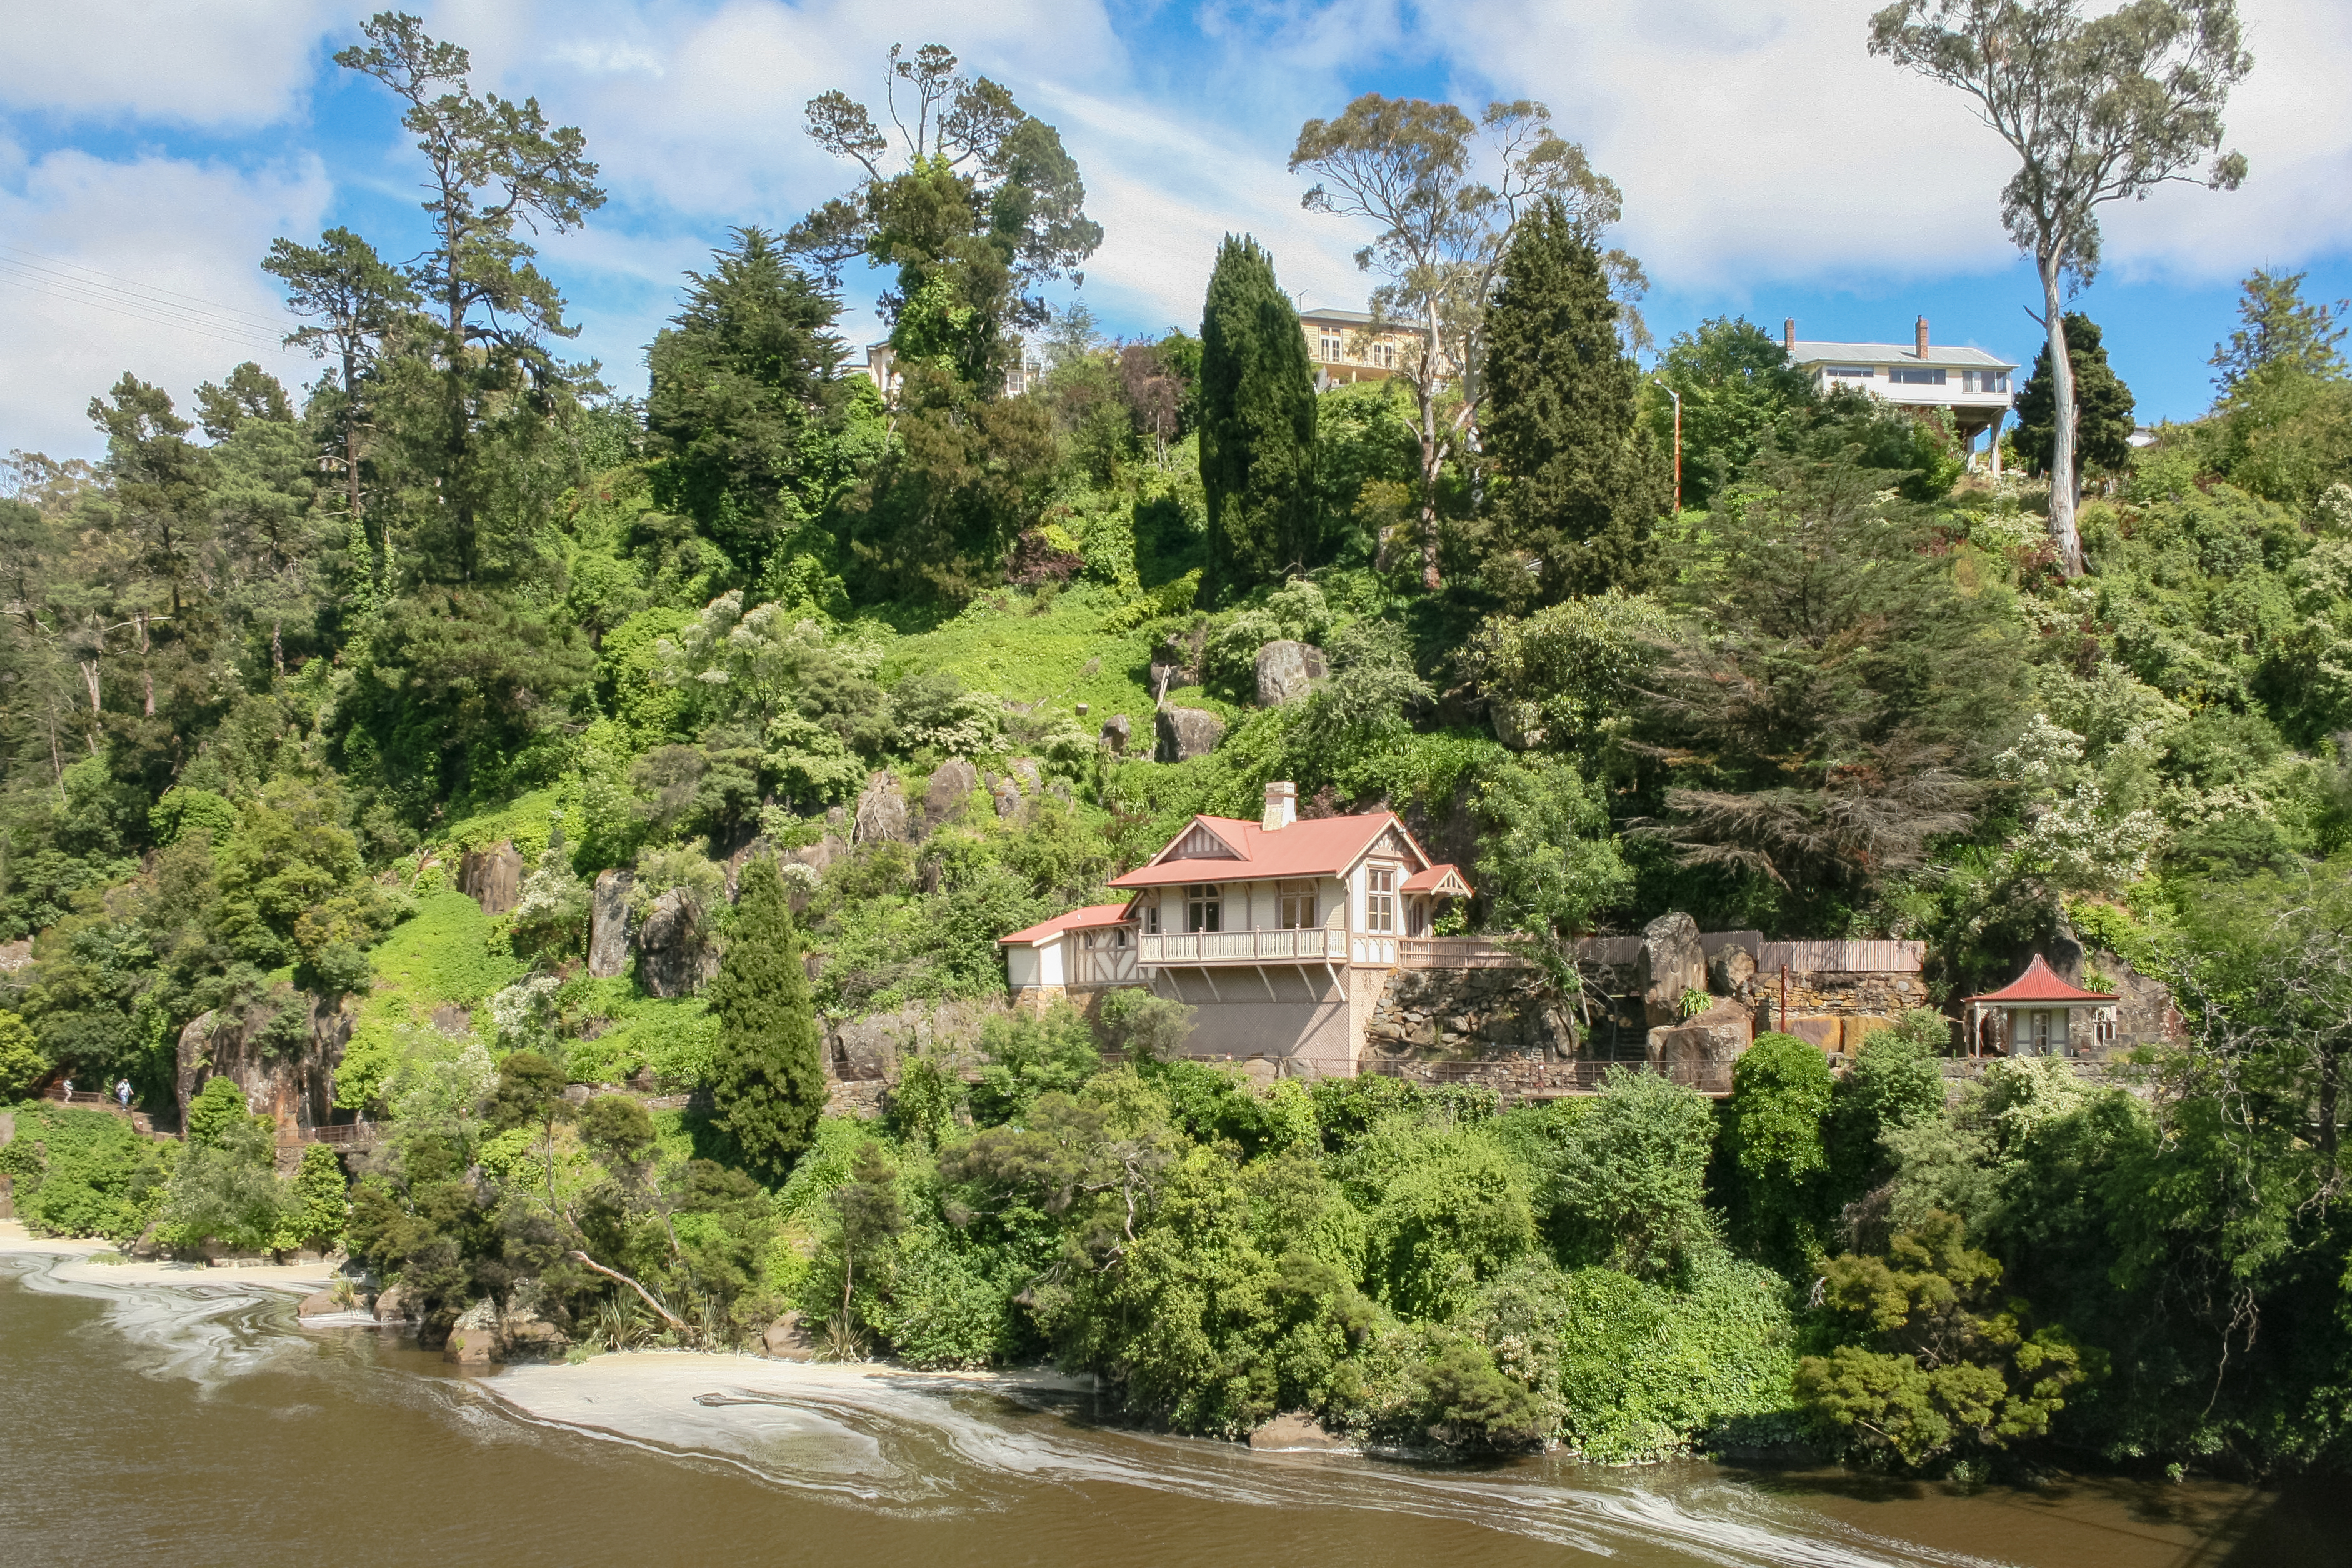 Wedding photographers launceston tasmania Oxandrolone - Wikipedia